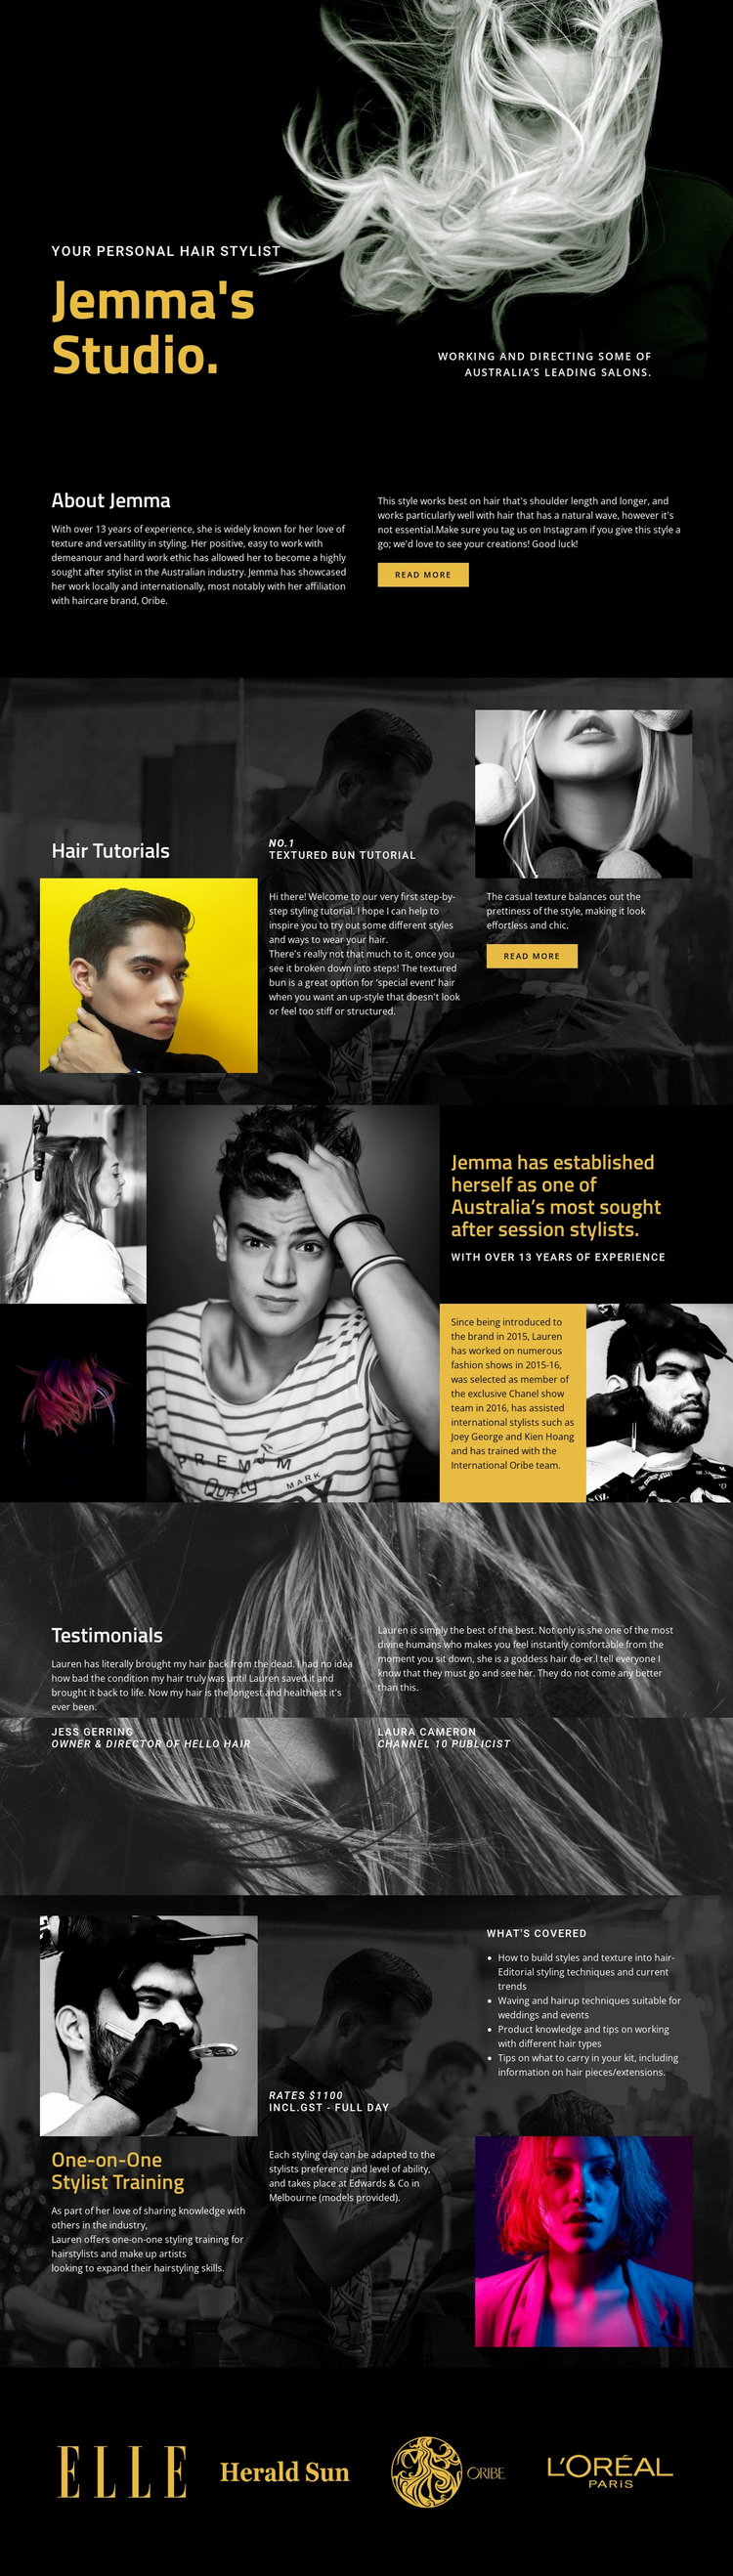 Winning ideas for fashion Website Builder Software